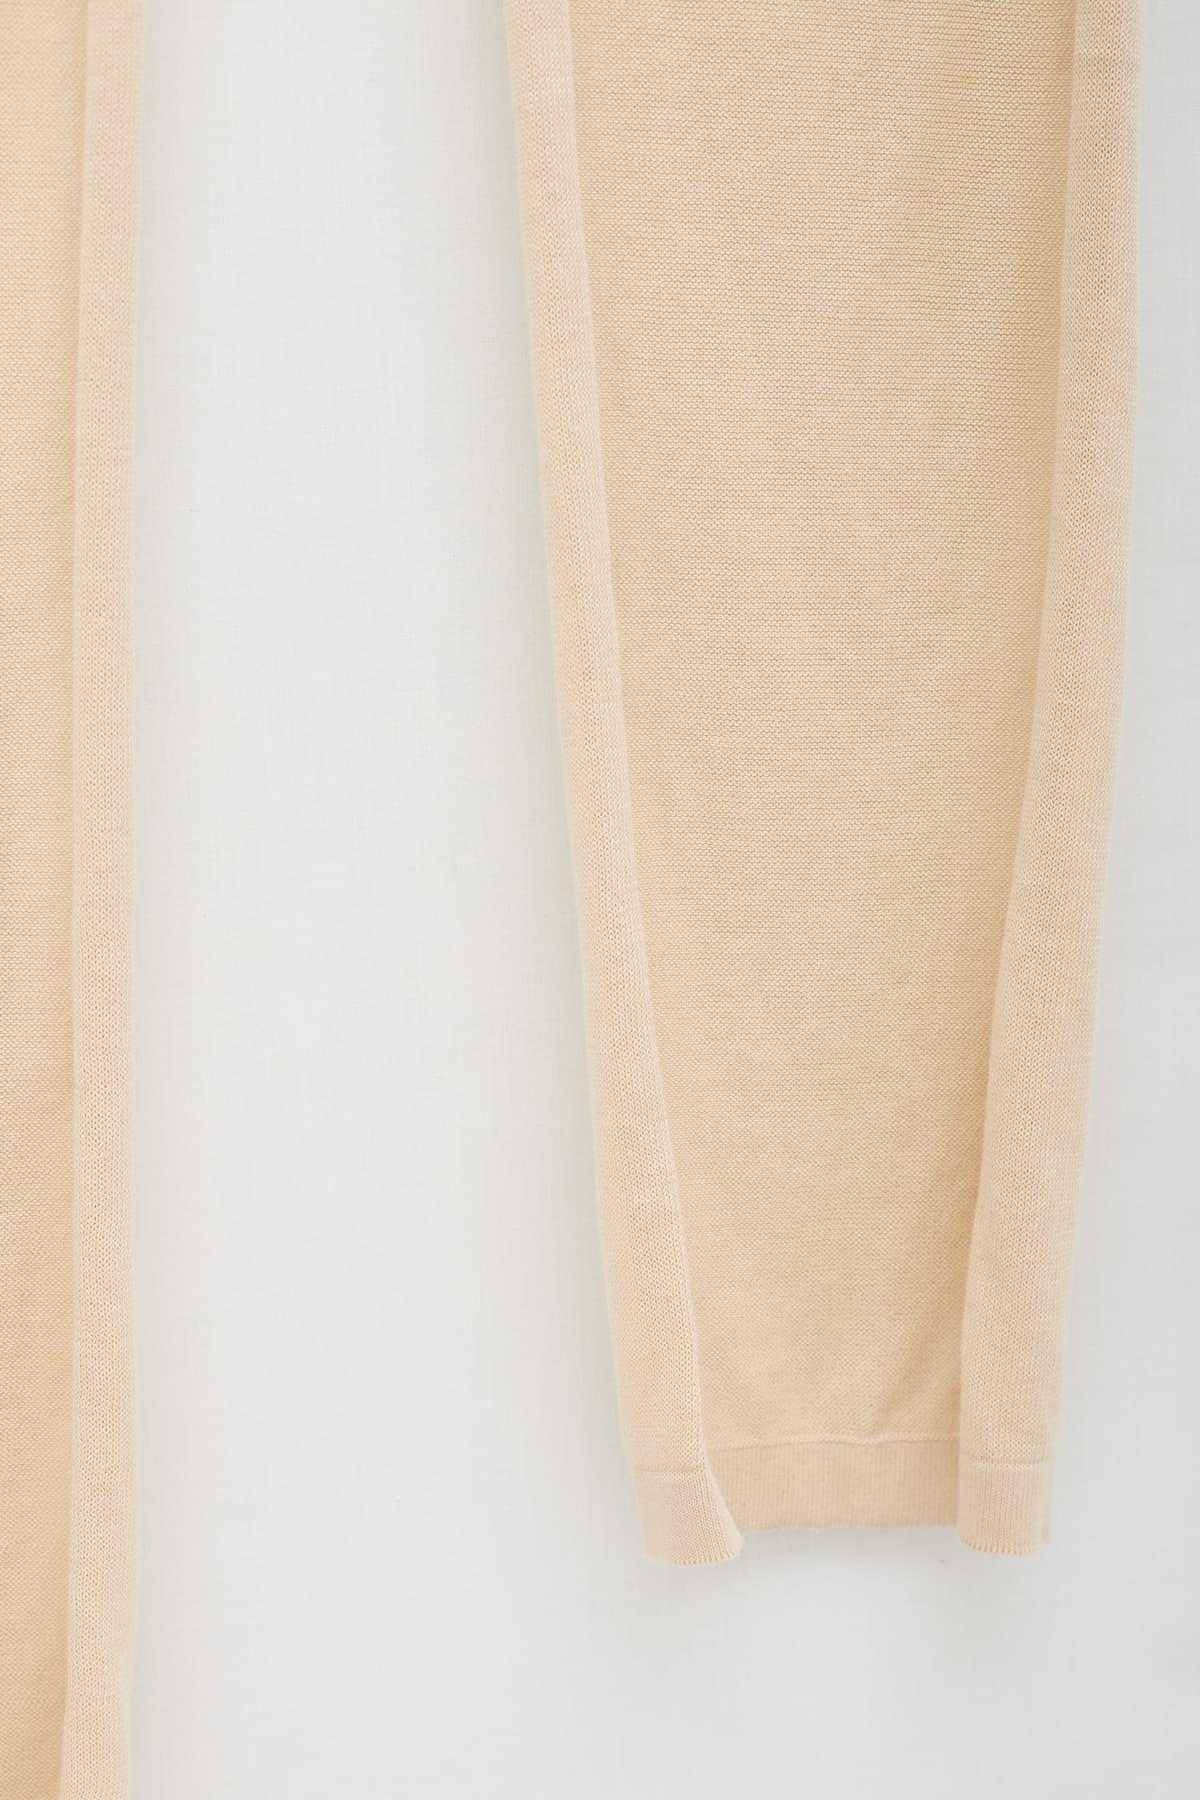 Comprar Acne Studios White Distorted BAGS000178 Handbag